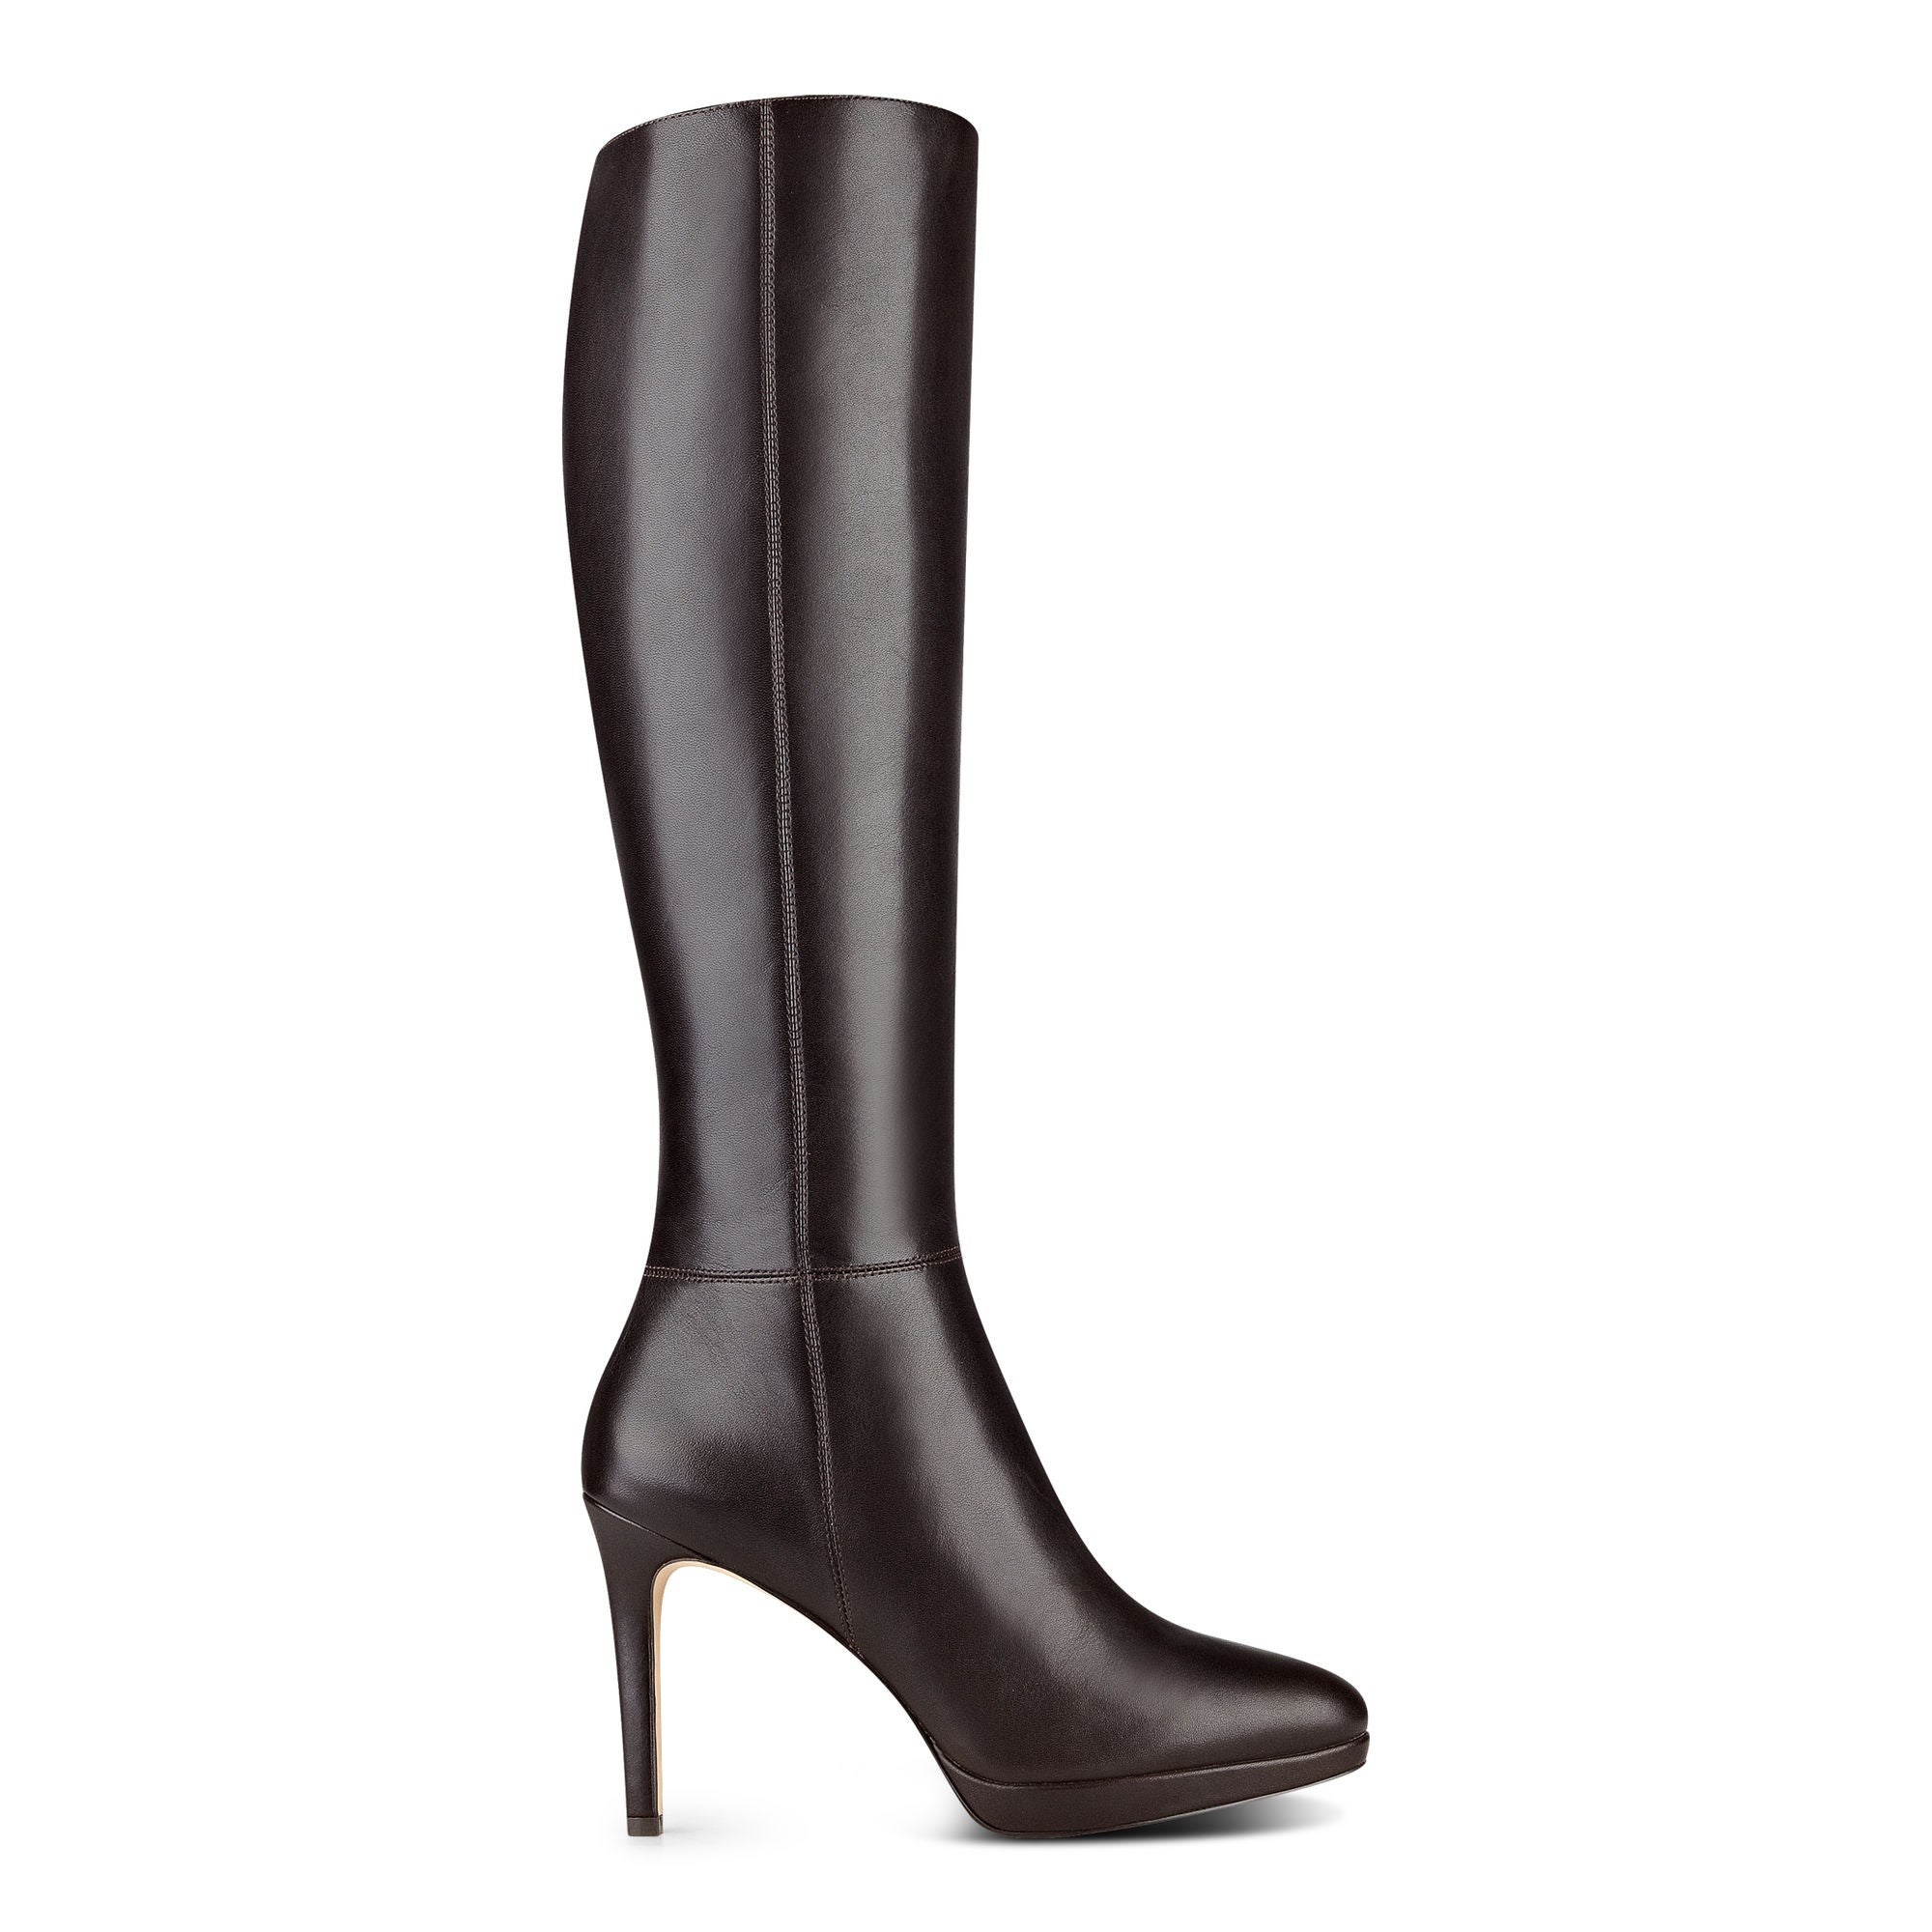 15 Fierce Fall Boots That Fit Over Big Calves 5f51c31c5